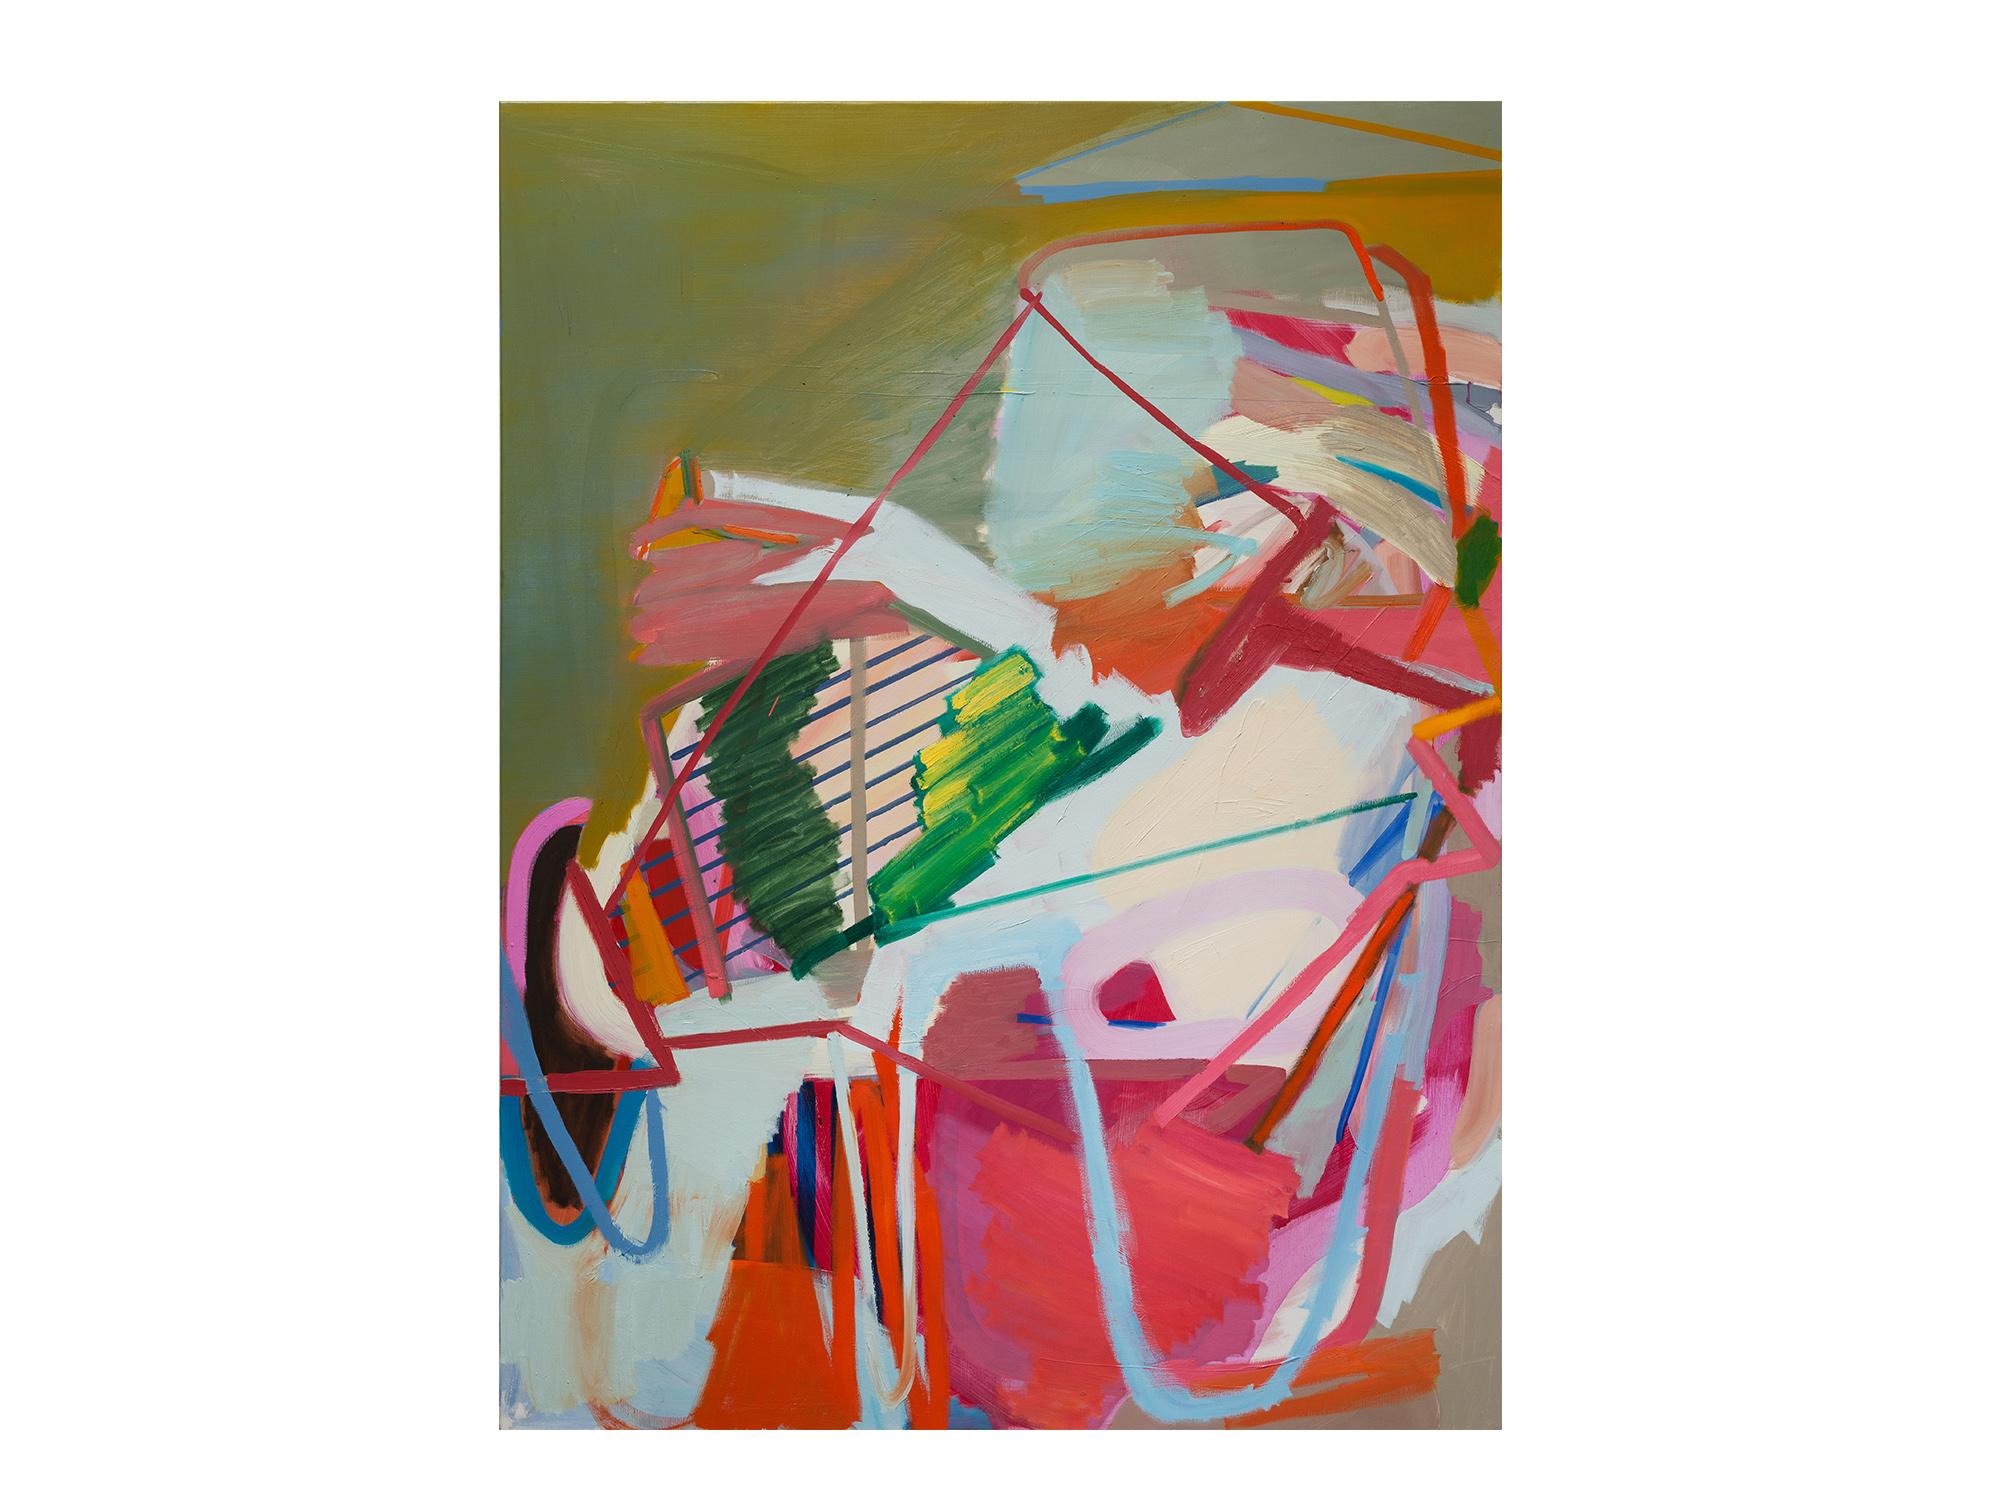 Julia Powles   Radioactive Me , 2017 oil on canvas 188 x 139cm   ARTIST BIO